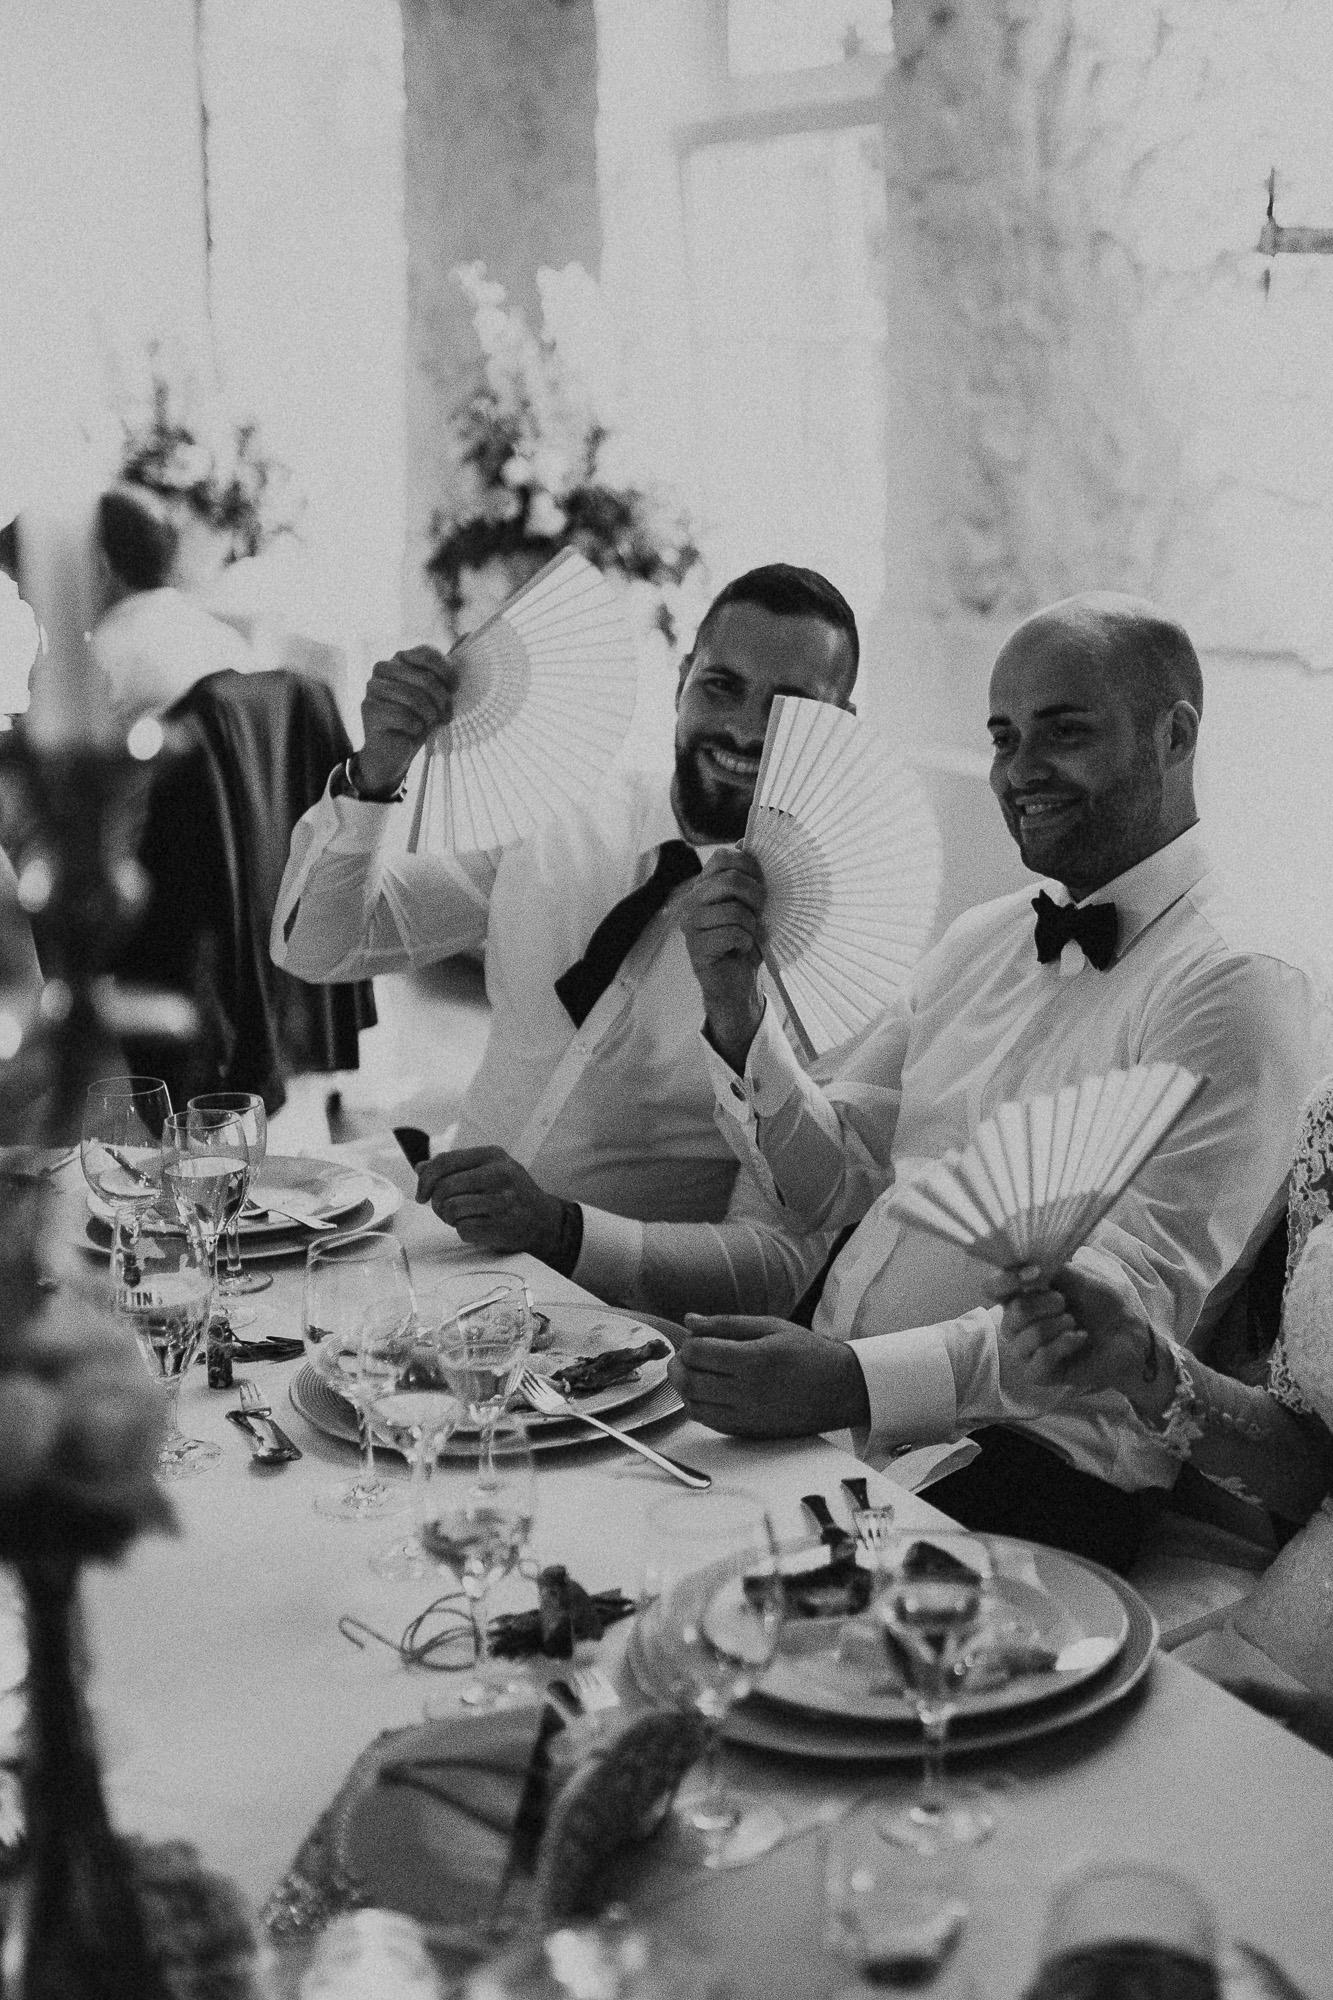 DanielaMarquardtPhotography_Hochzeitsfotograf_Düsseldorf_Köln_Mallorca_Bayern_Austria_Harz_Wedding_AileenundLennart_Weddingphotographer_Ibiza_Tuskany_Italien_Toskana_Portugal_Lissabon249